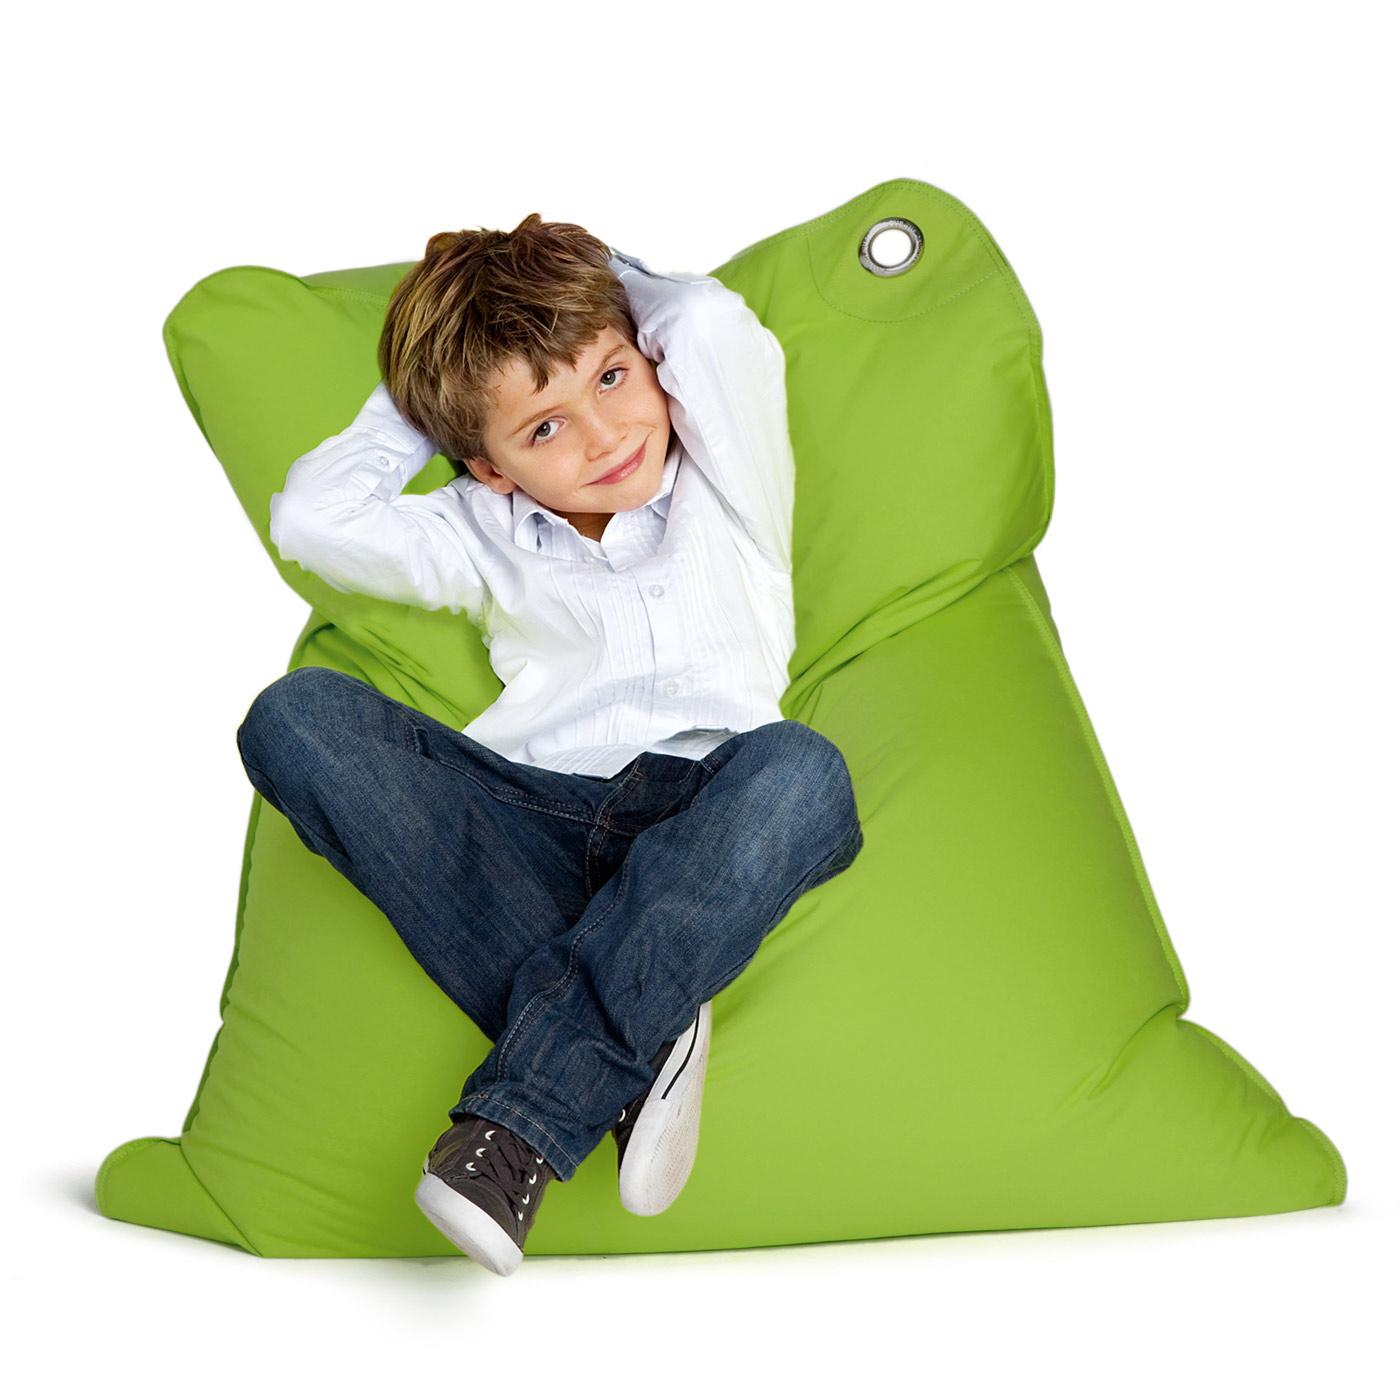 sitting bull mini sitzkissen preisvergleich. Black Bedroom Furniture Sets. Home Design Ideas